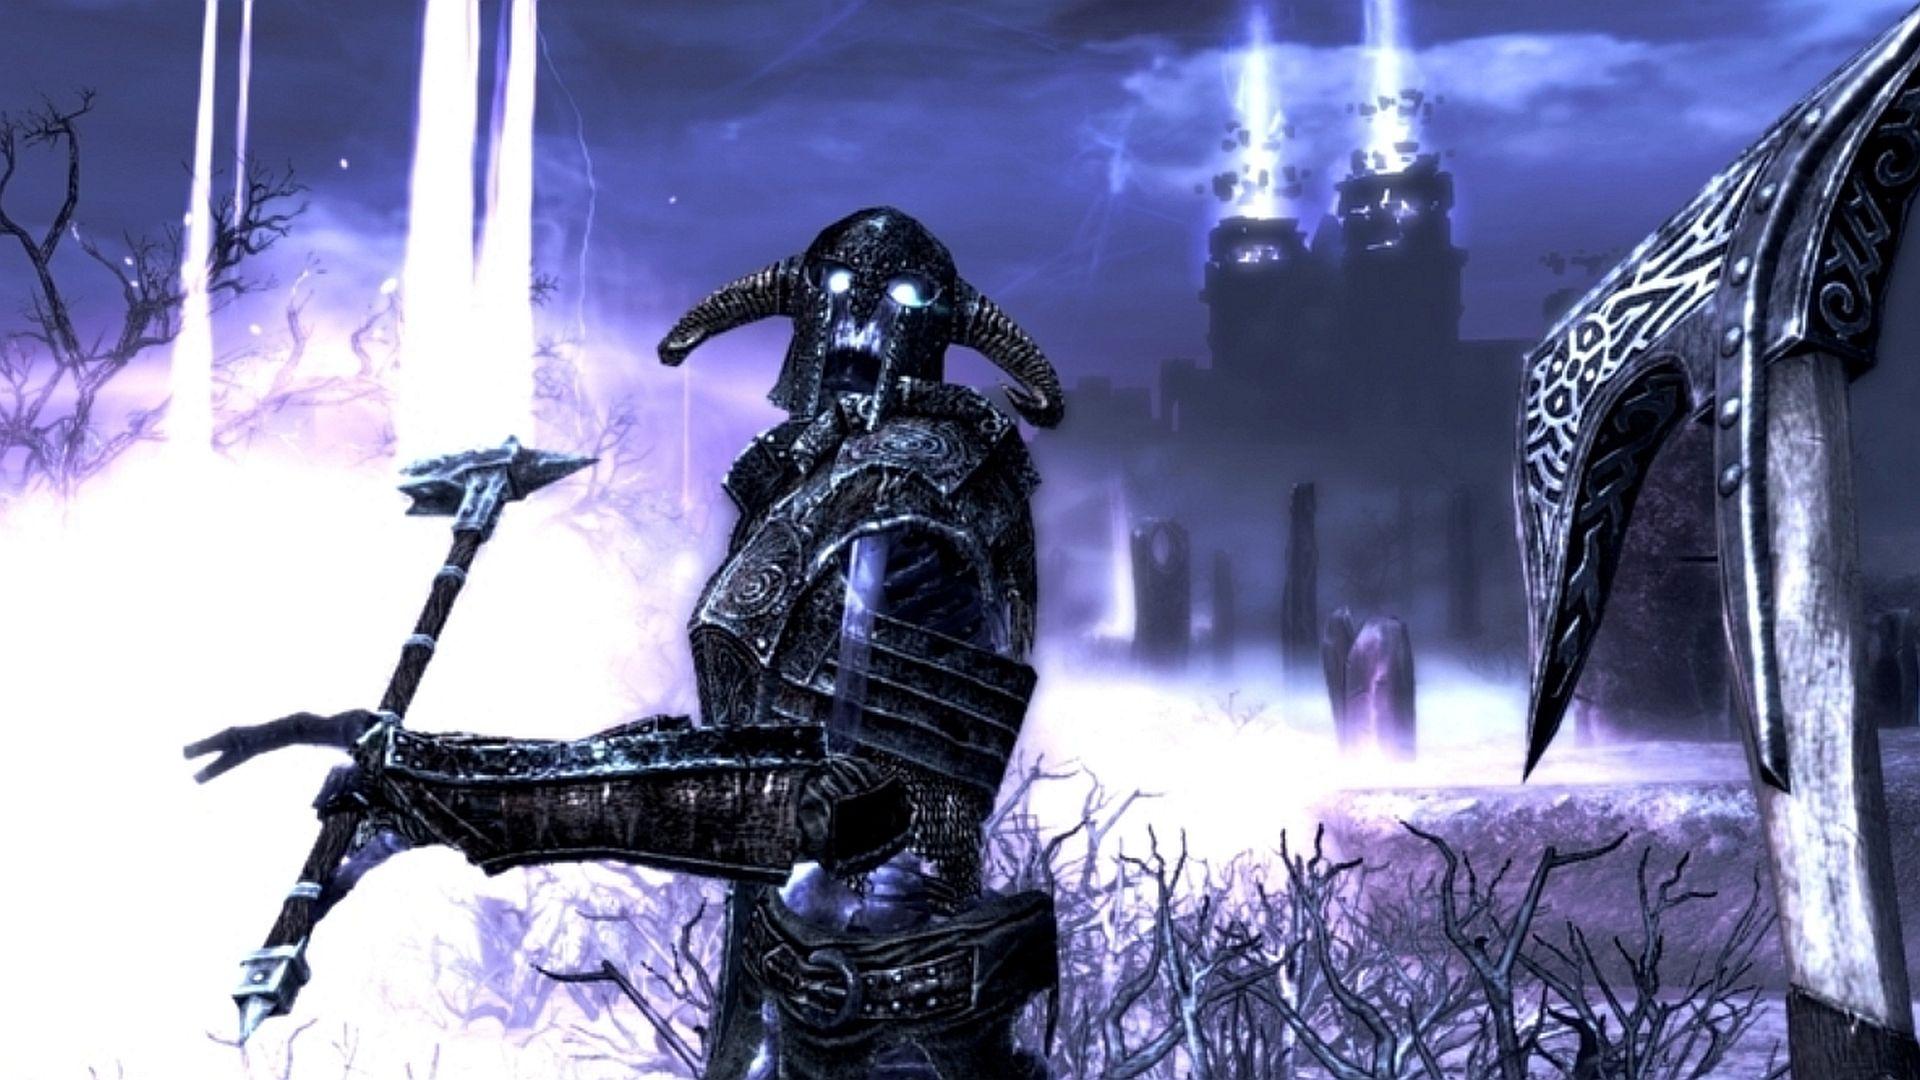 Skyrim fan creates a gorgeously spooky 'Champion of Namira' armour concept